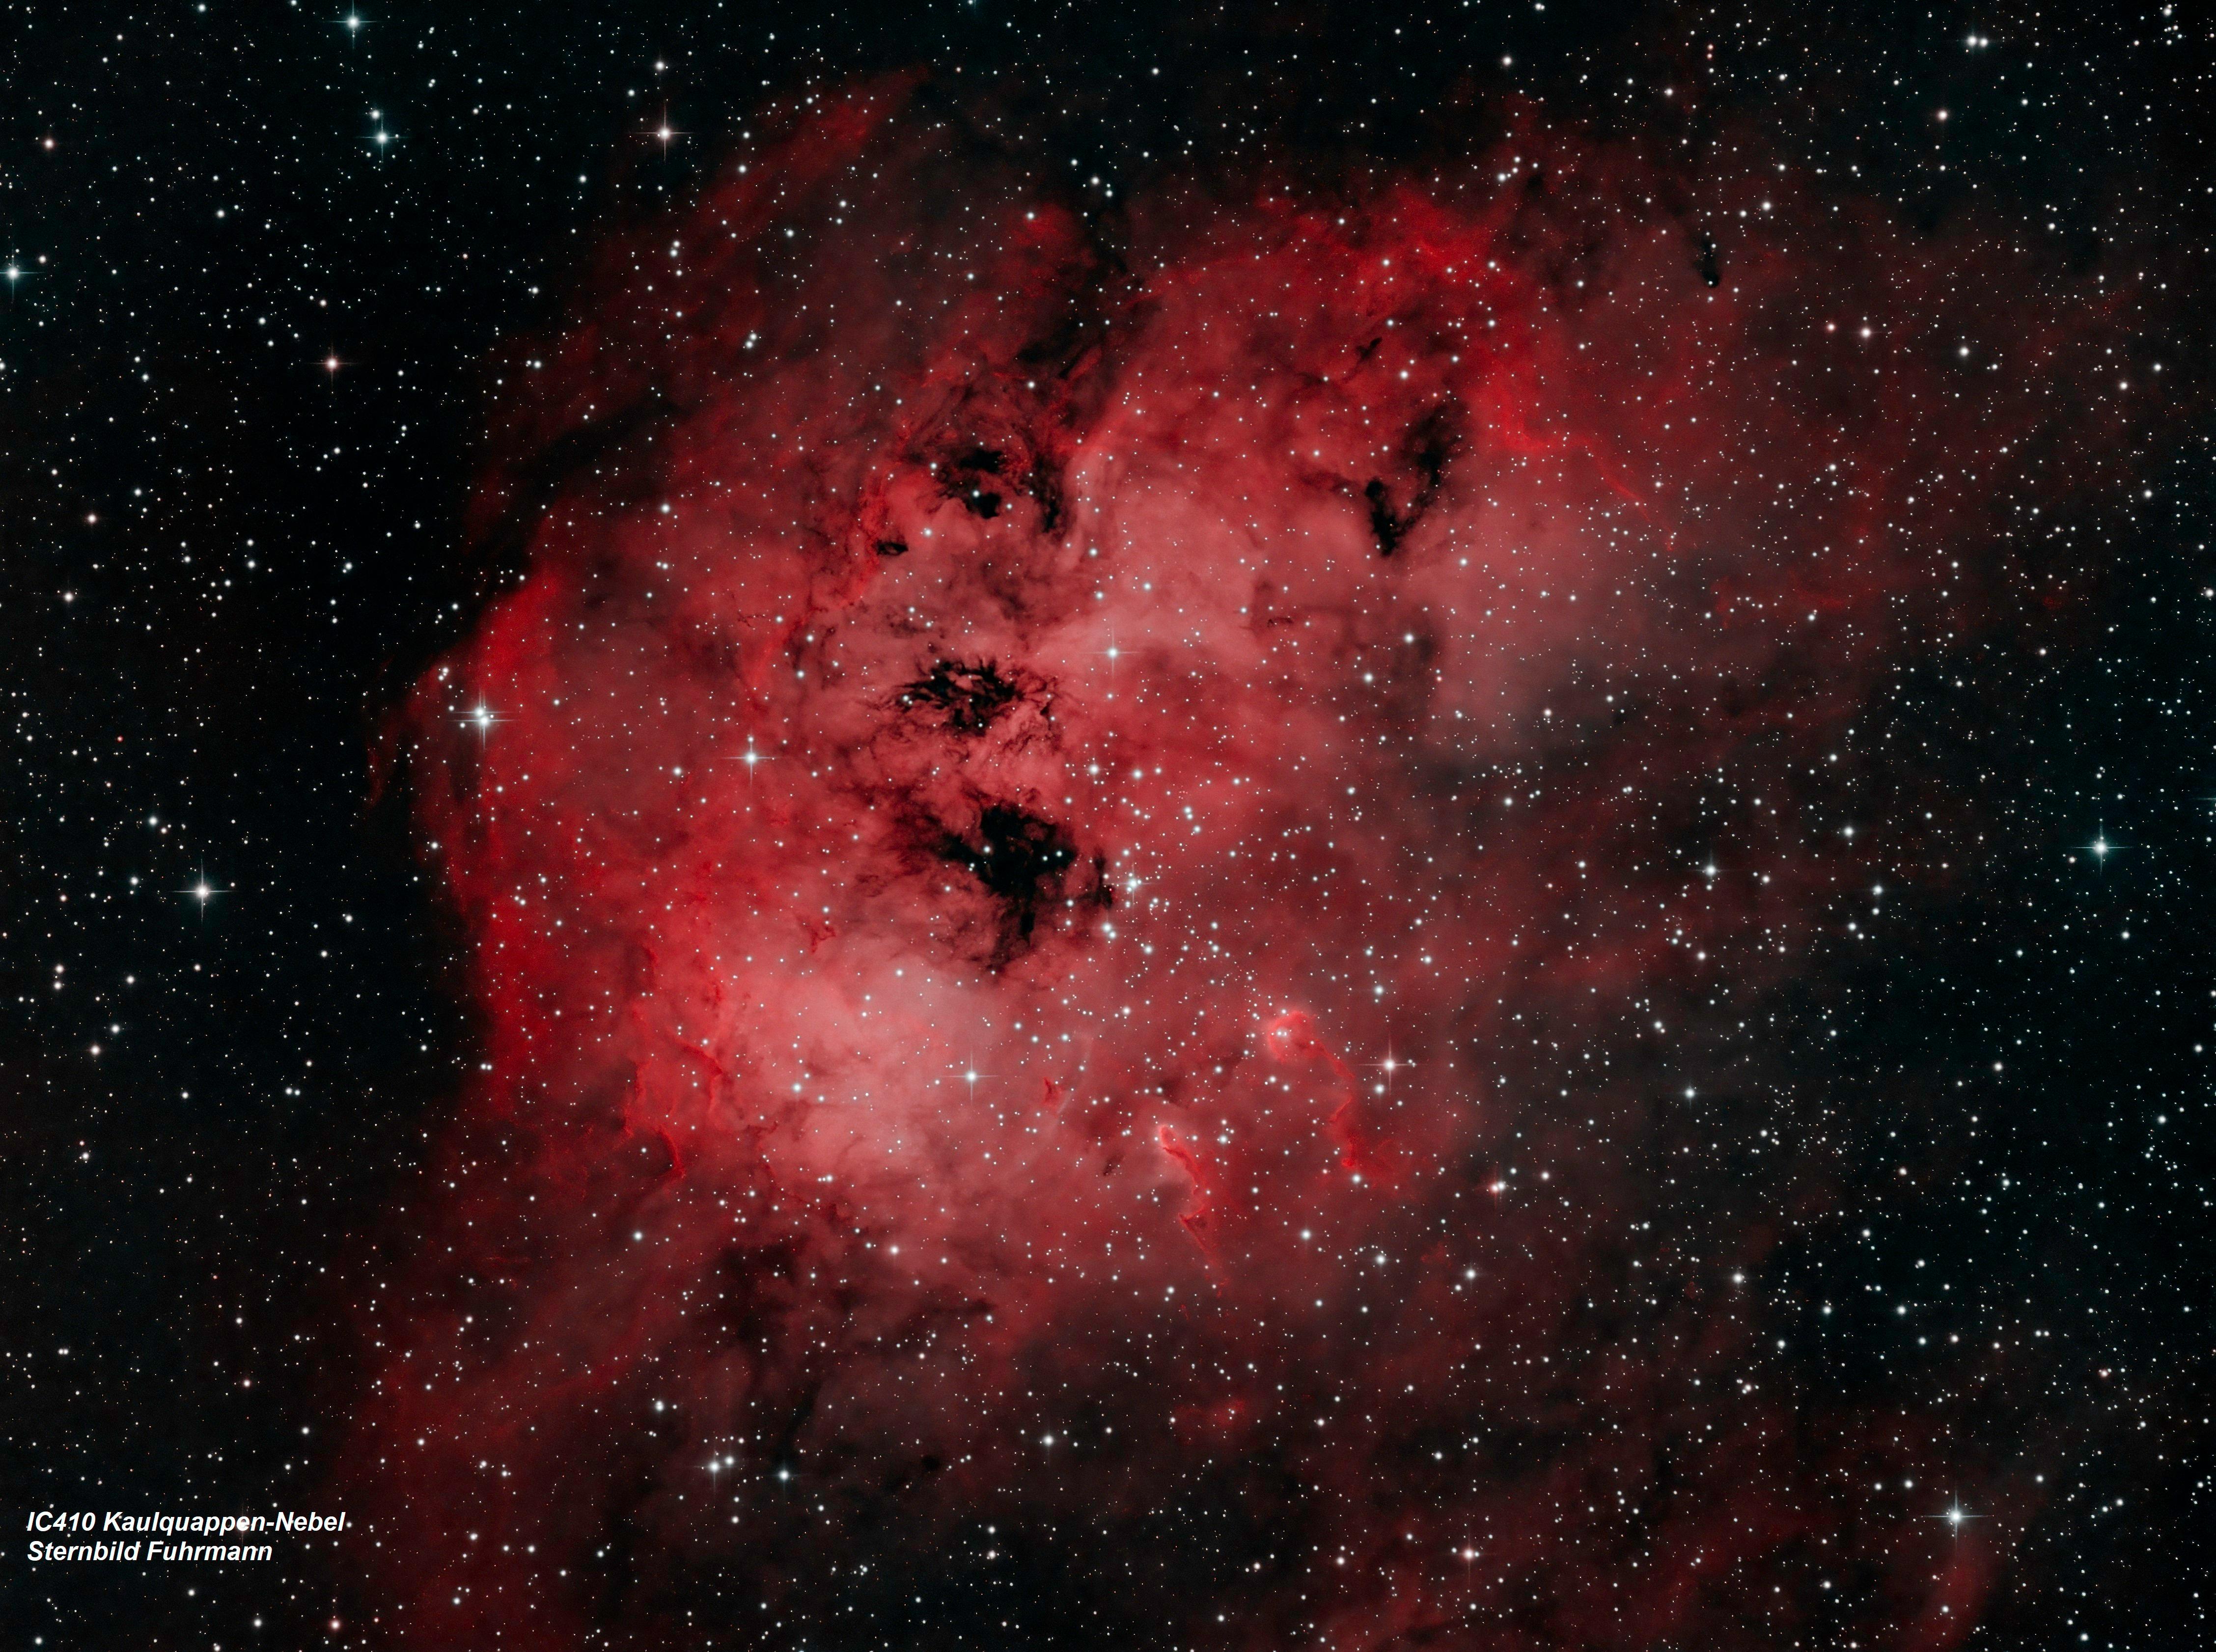 IC410 Kaulquappen Nebel